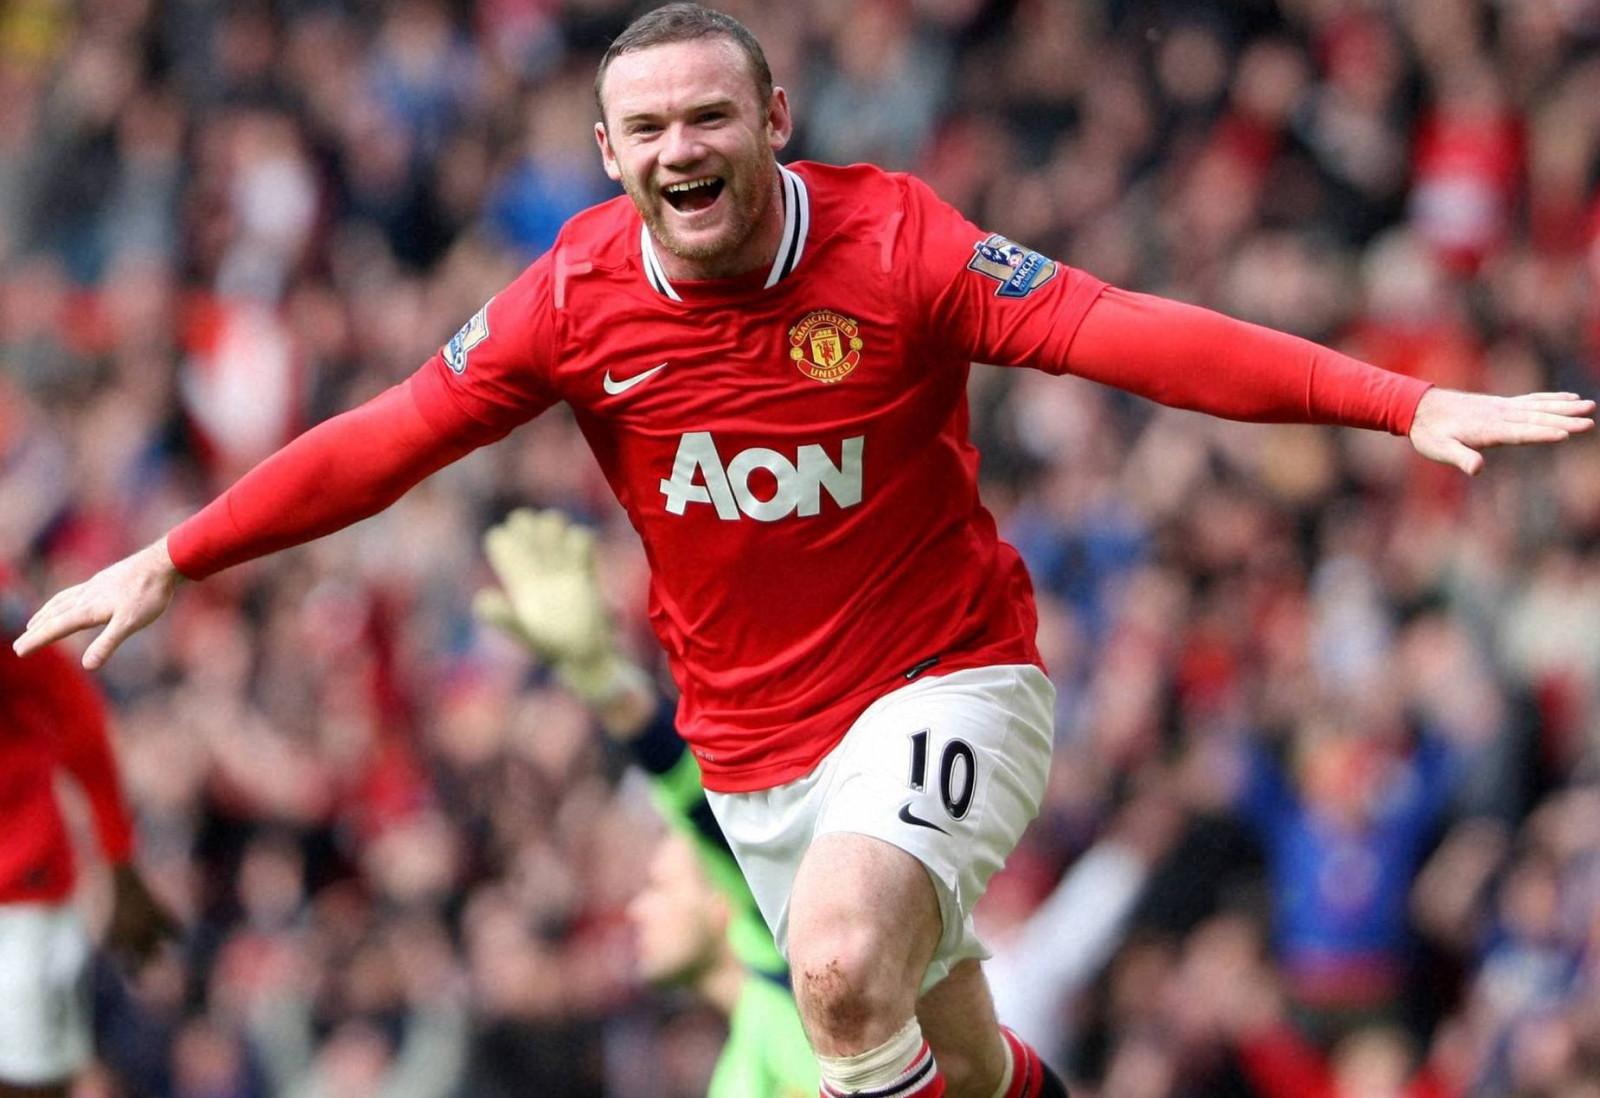 Wallpaper Olahraga Sepak Bola Manchester United Lari